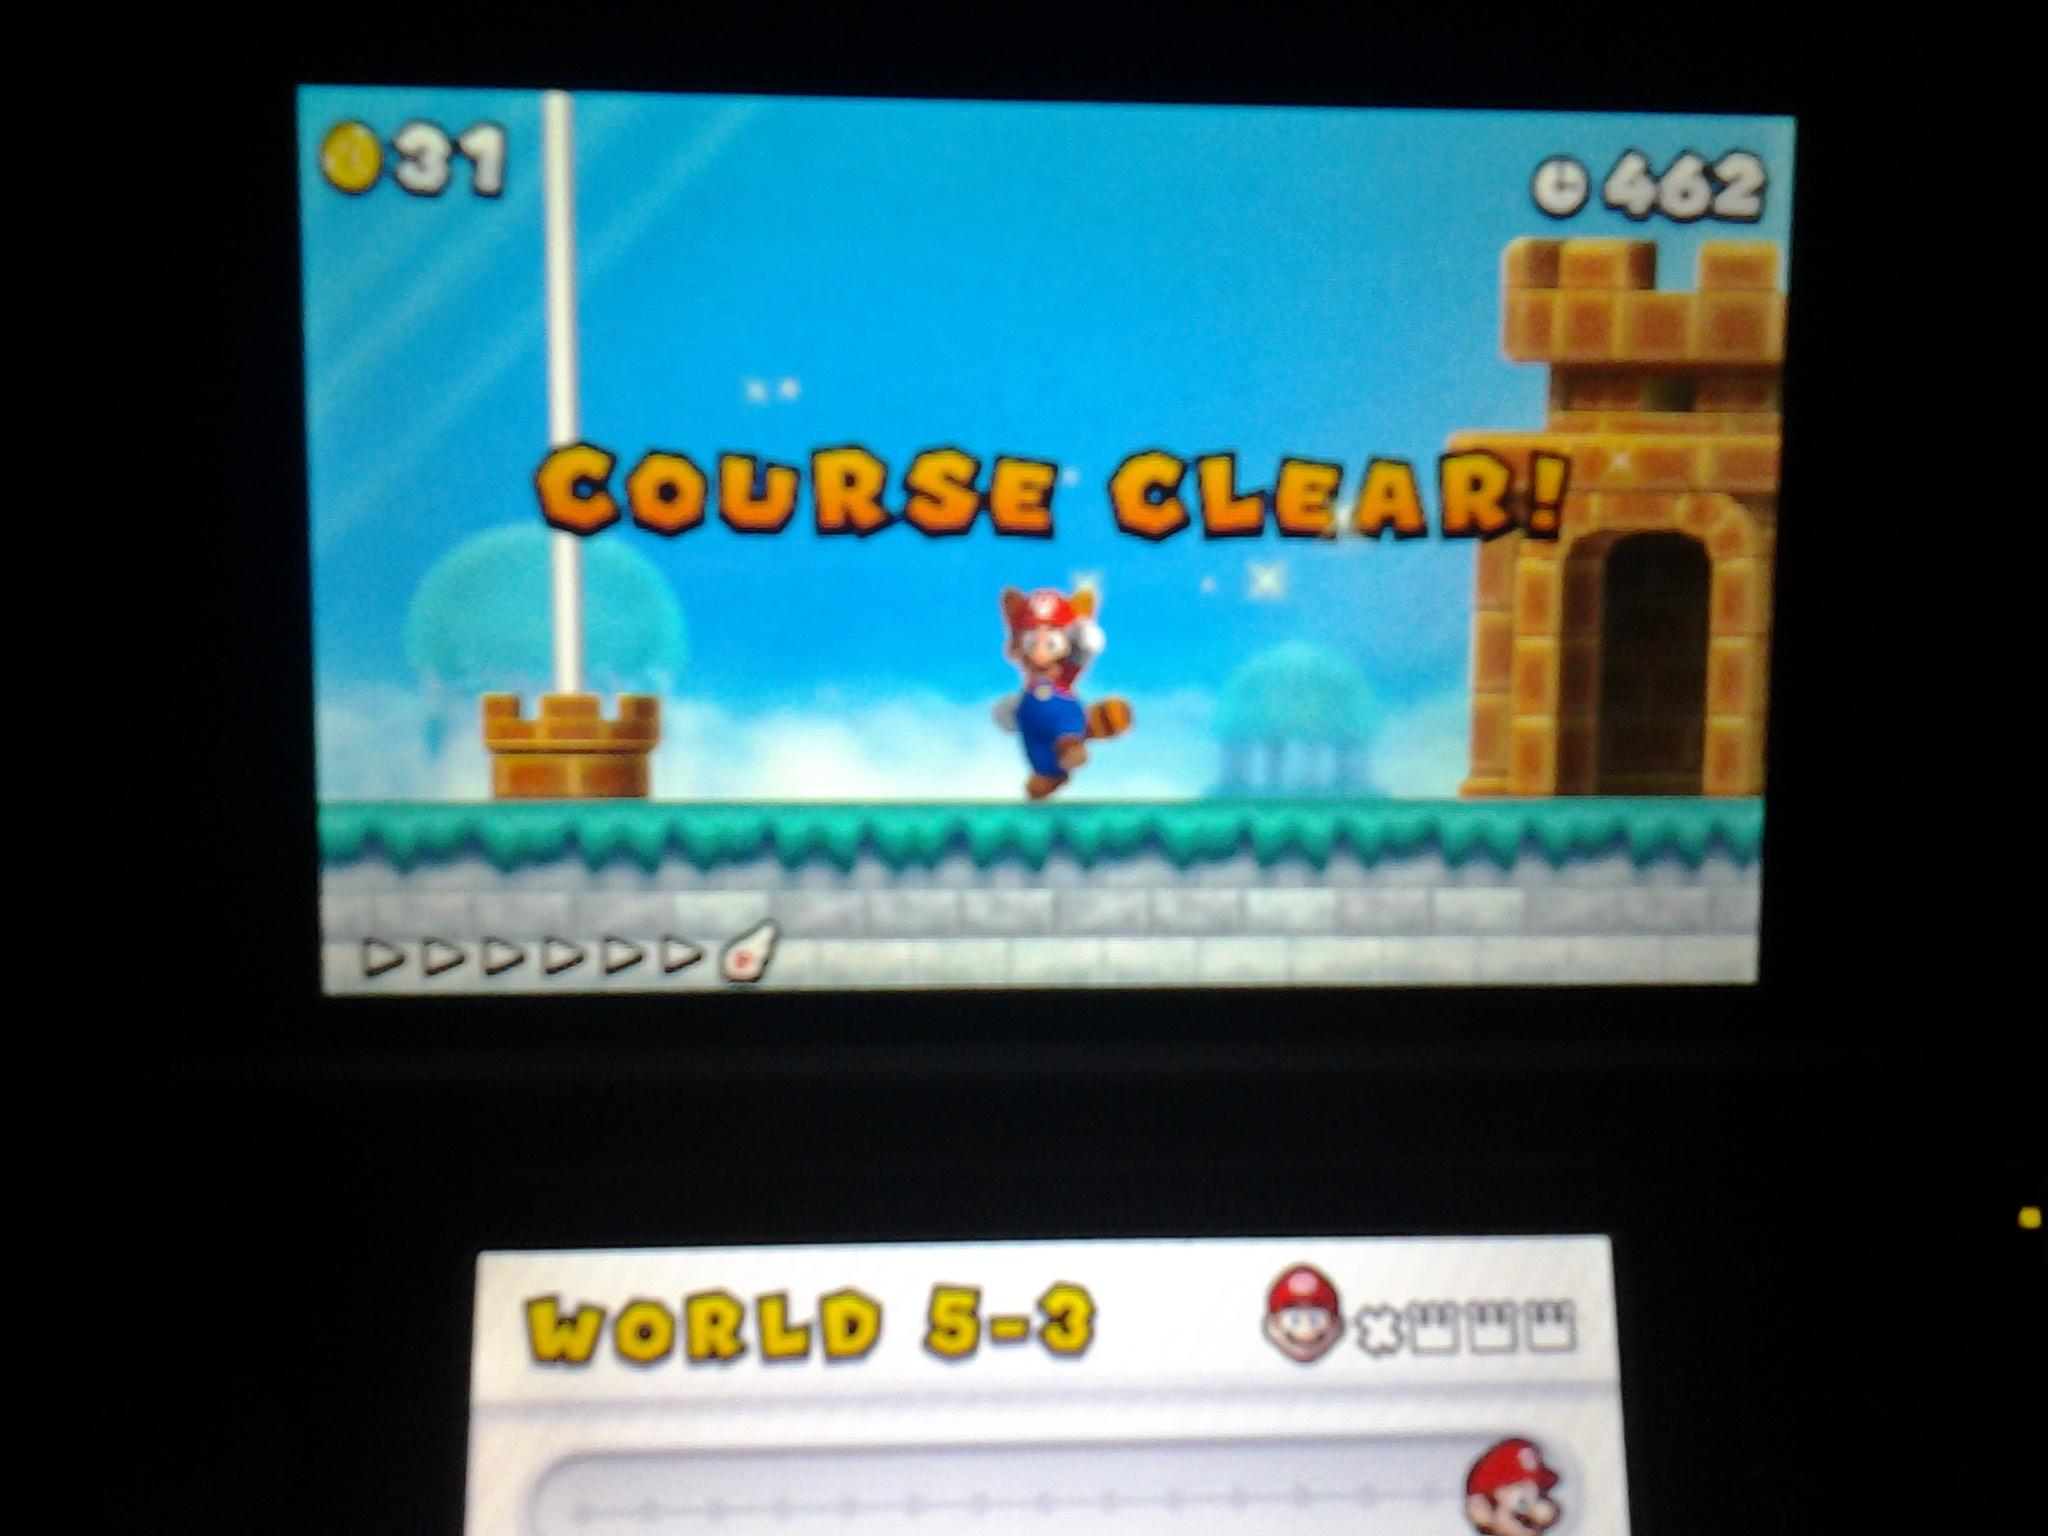 New Super Mario Bros  2: World 5-3 [Remaining Time] (Nintendo 3DS